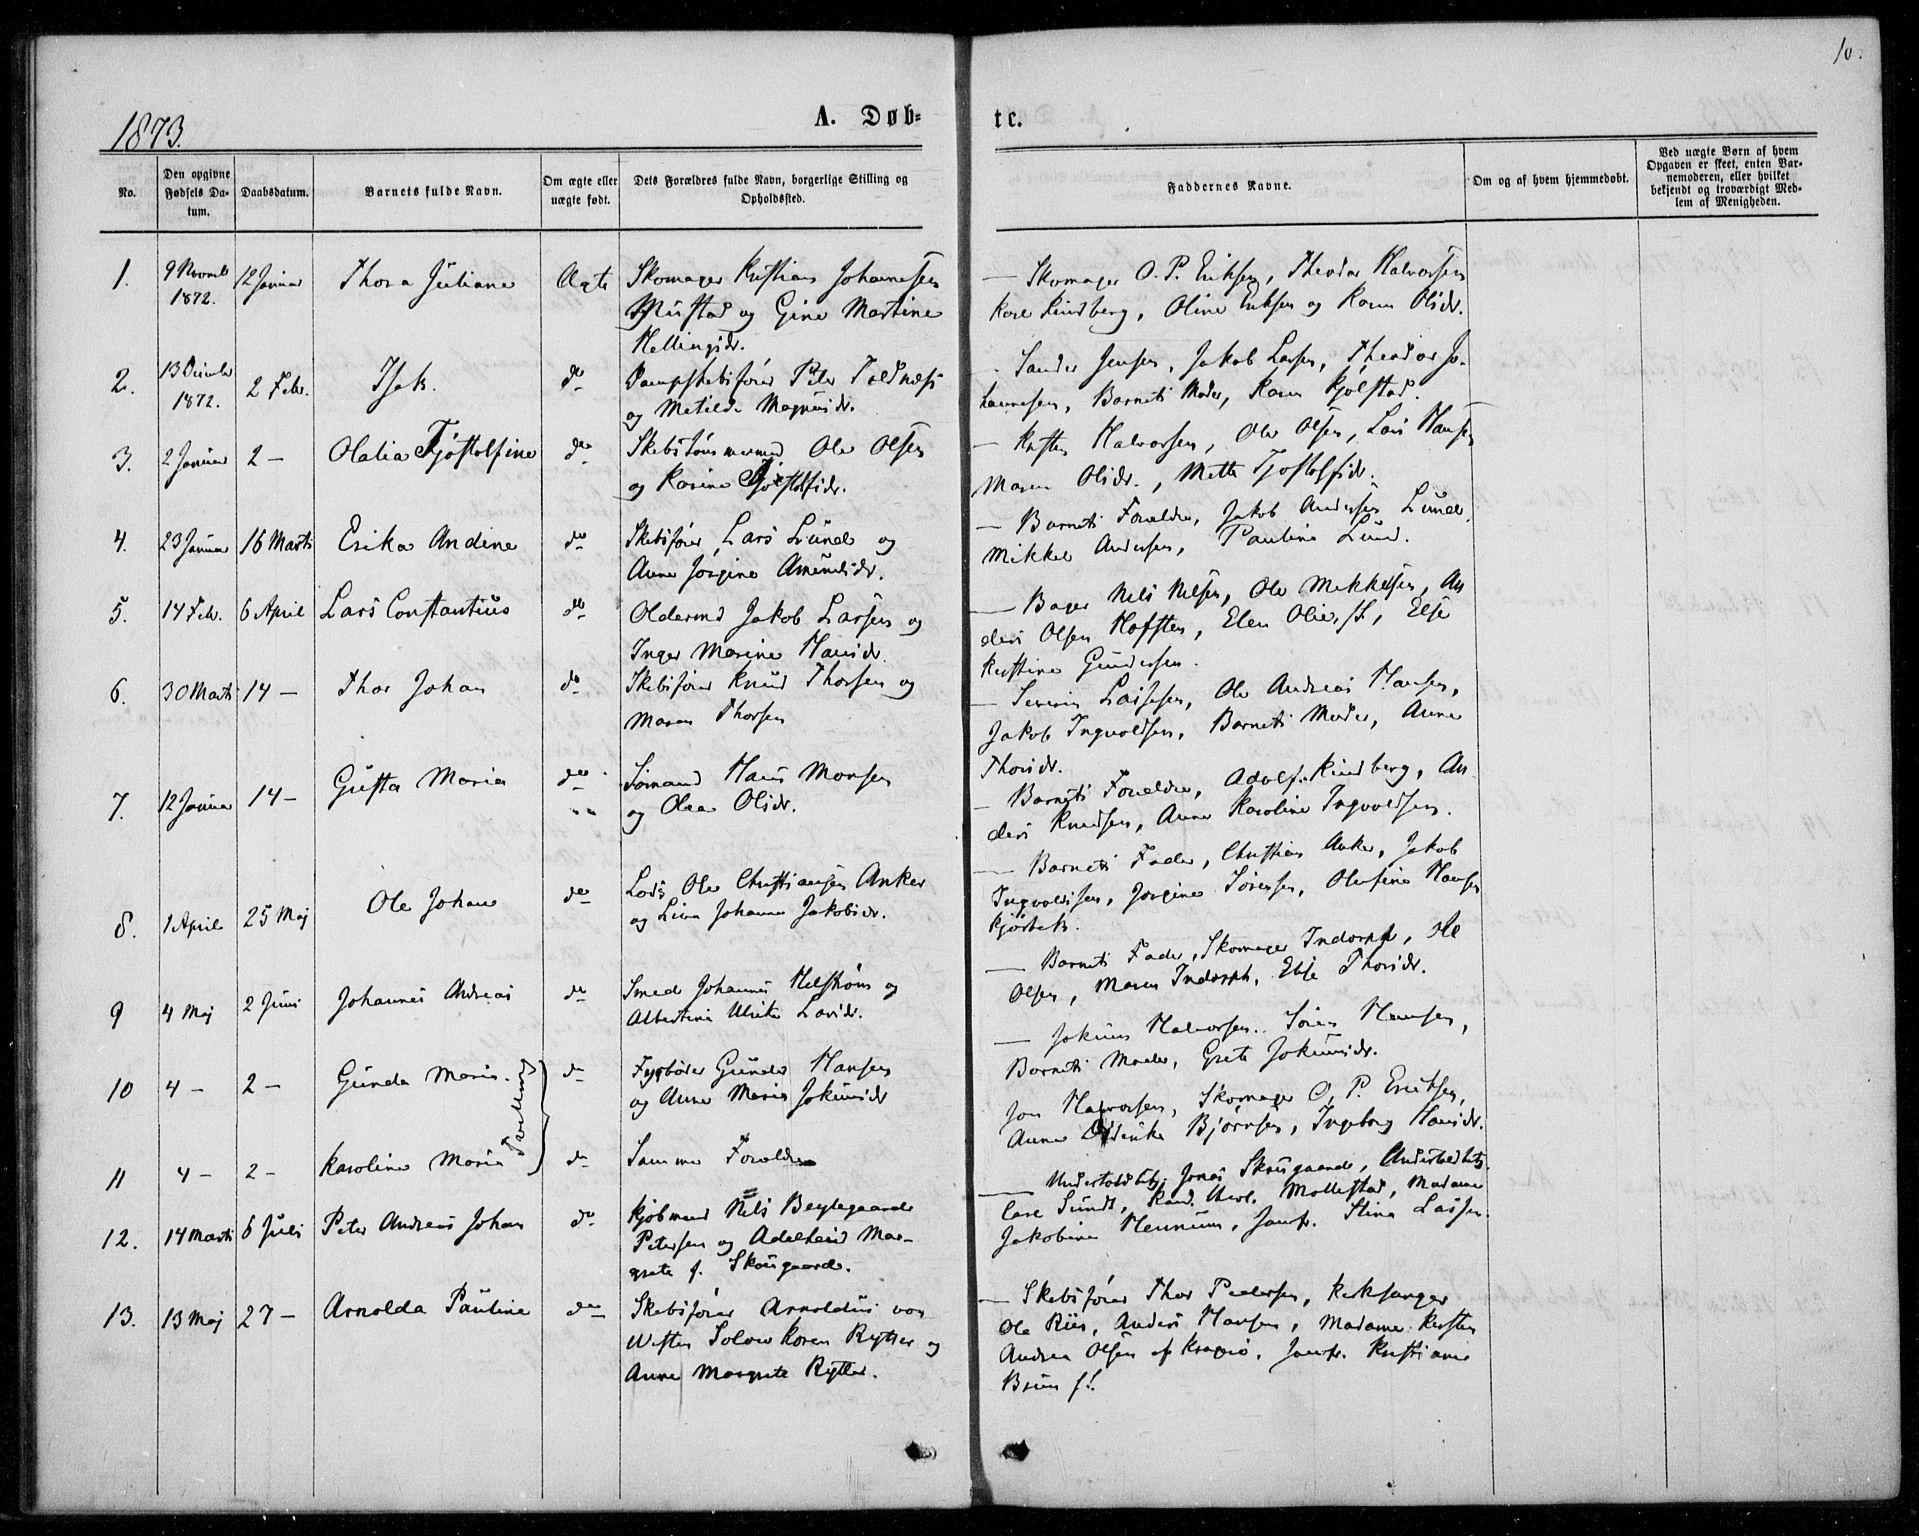 SAKO, Langesund kirkebøker, F/Fa/L0001: Ministerialbok nr. 1, 1870-1877, s. 10